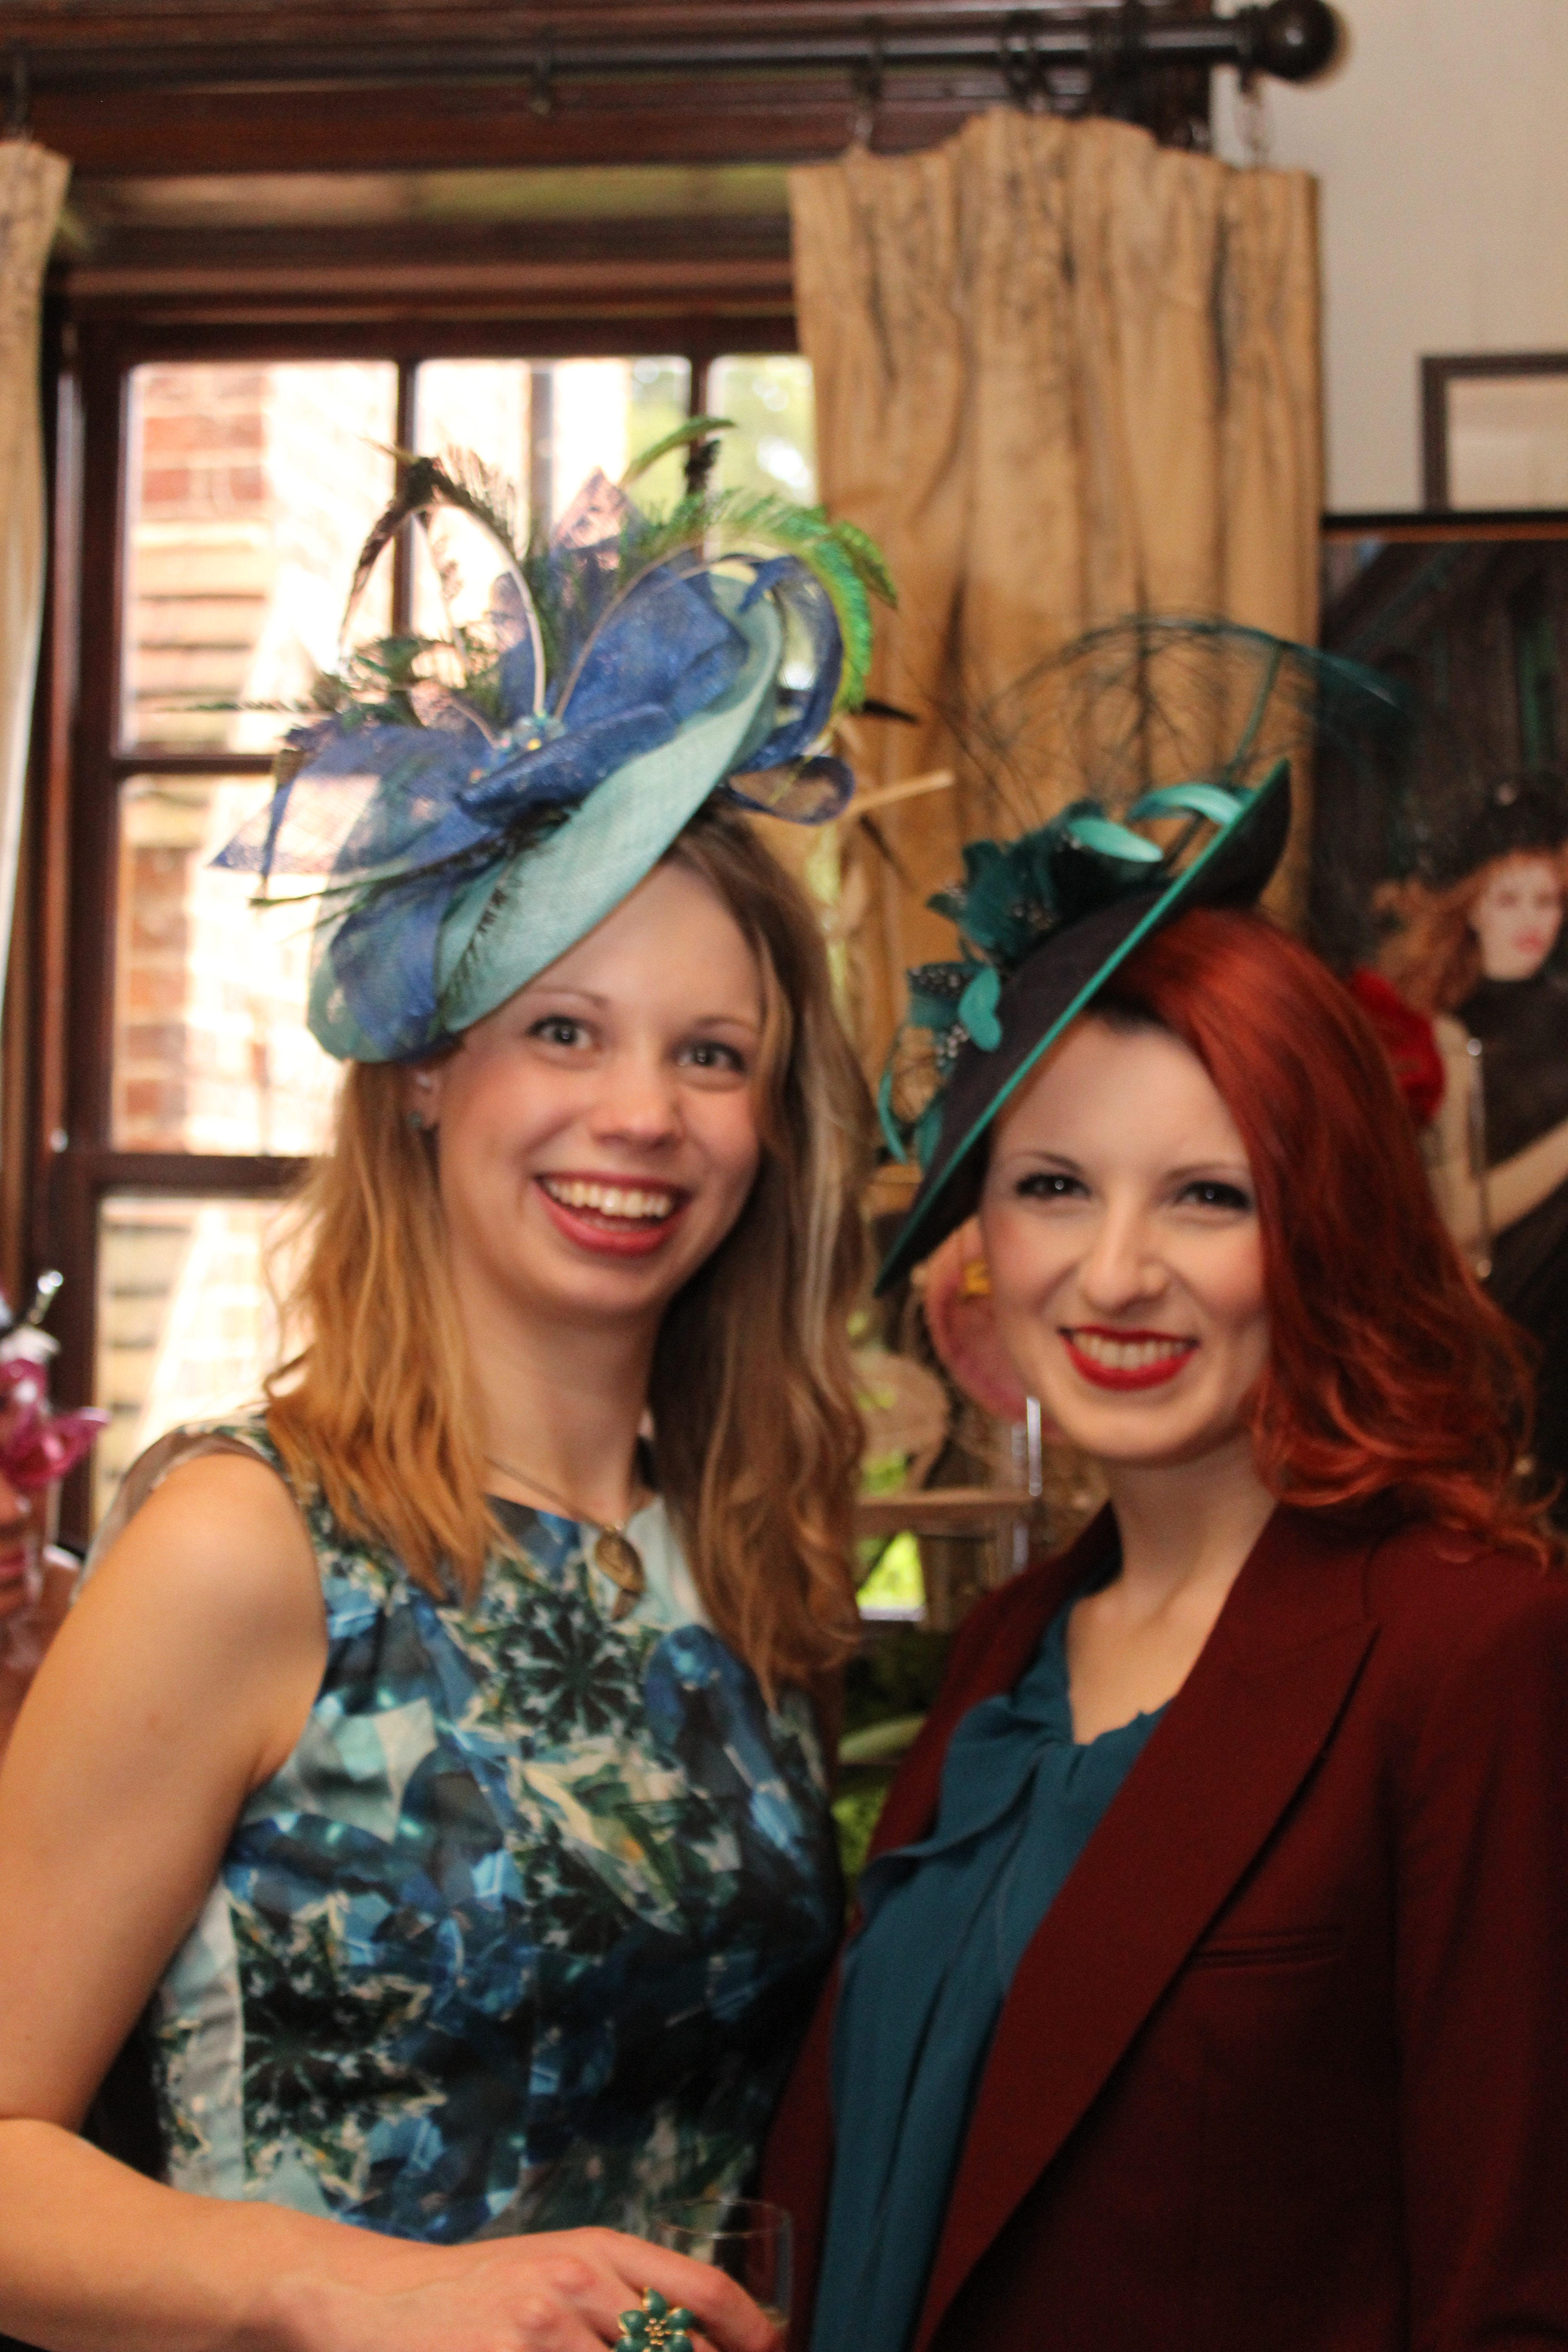 Women in hats - Beverley Edmondson Farnham